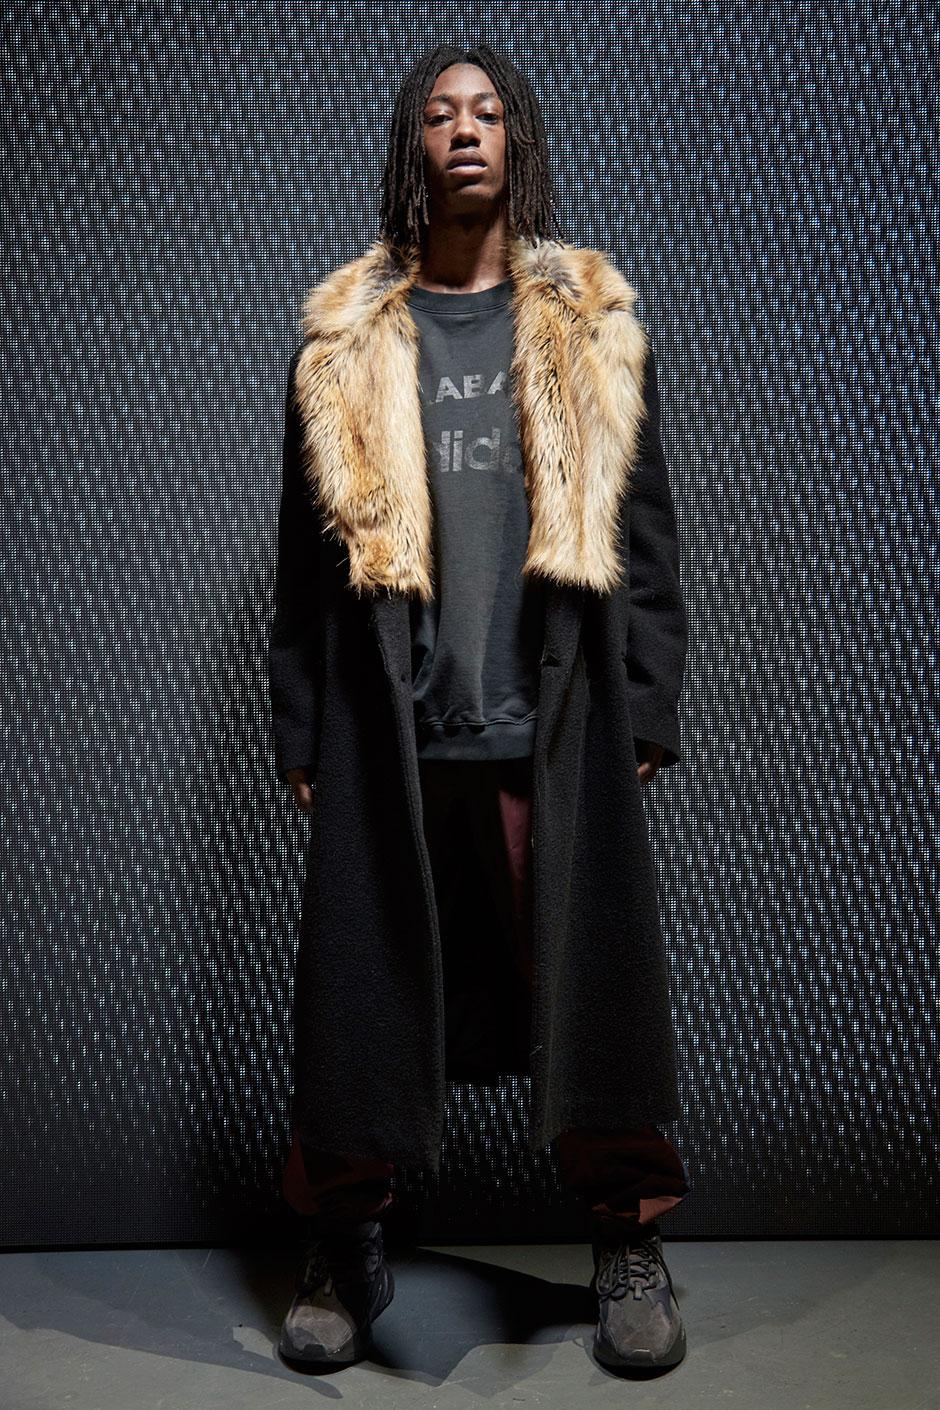 Kanye West Yeezy Shoes 2017